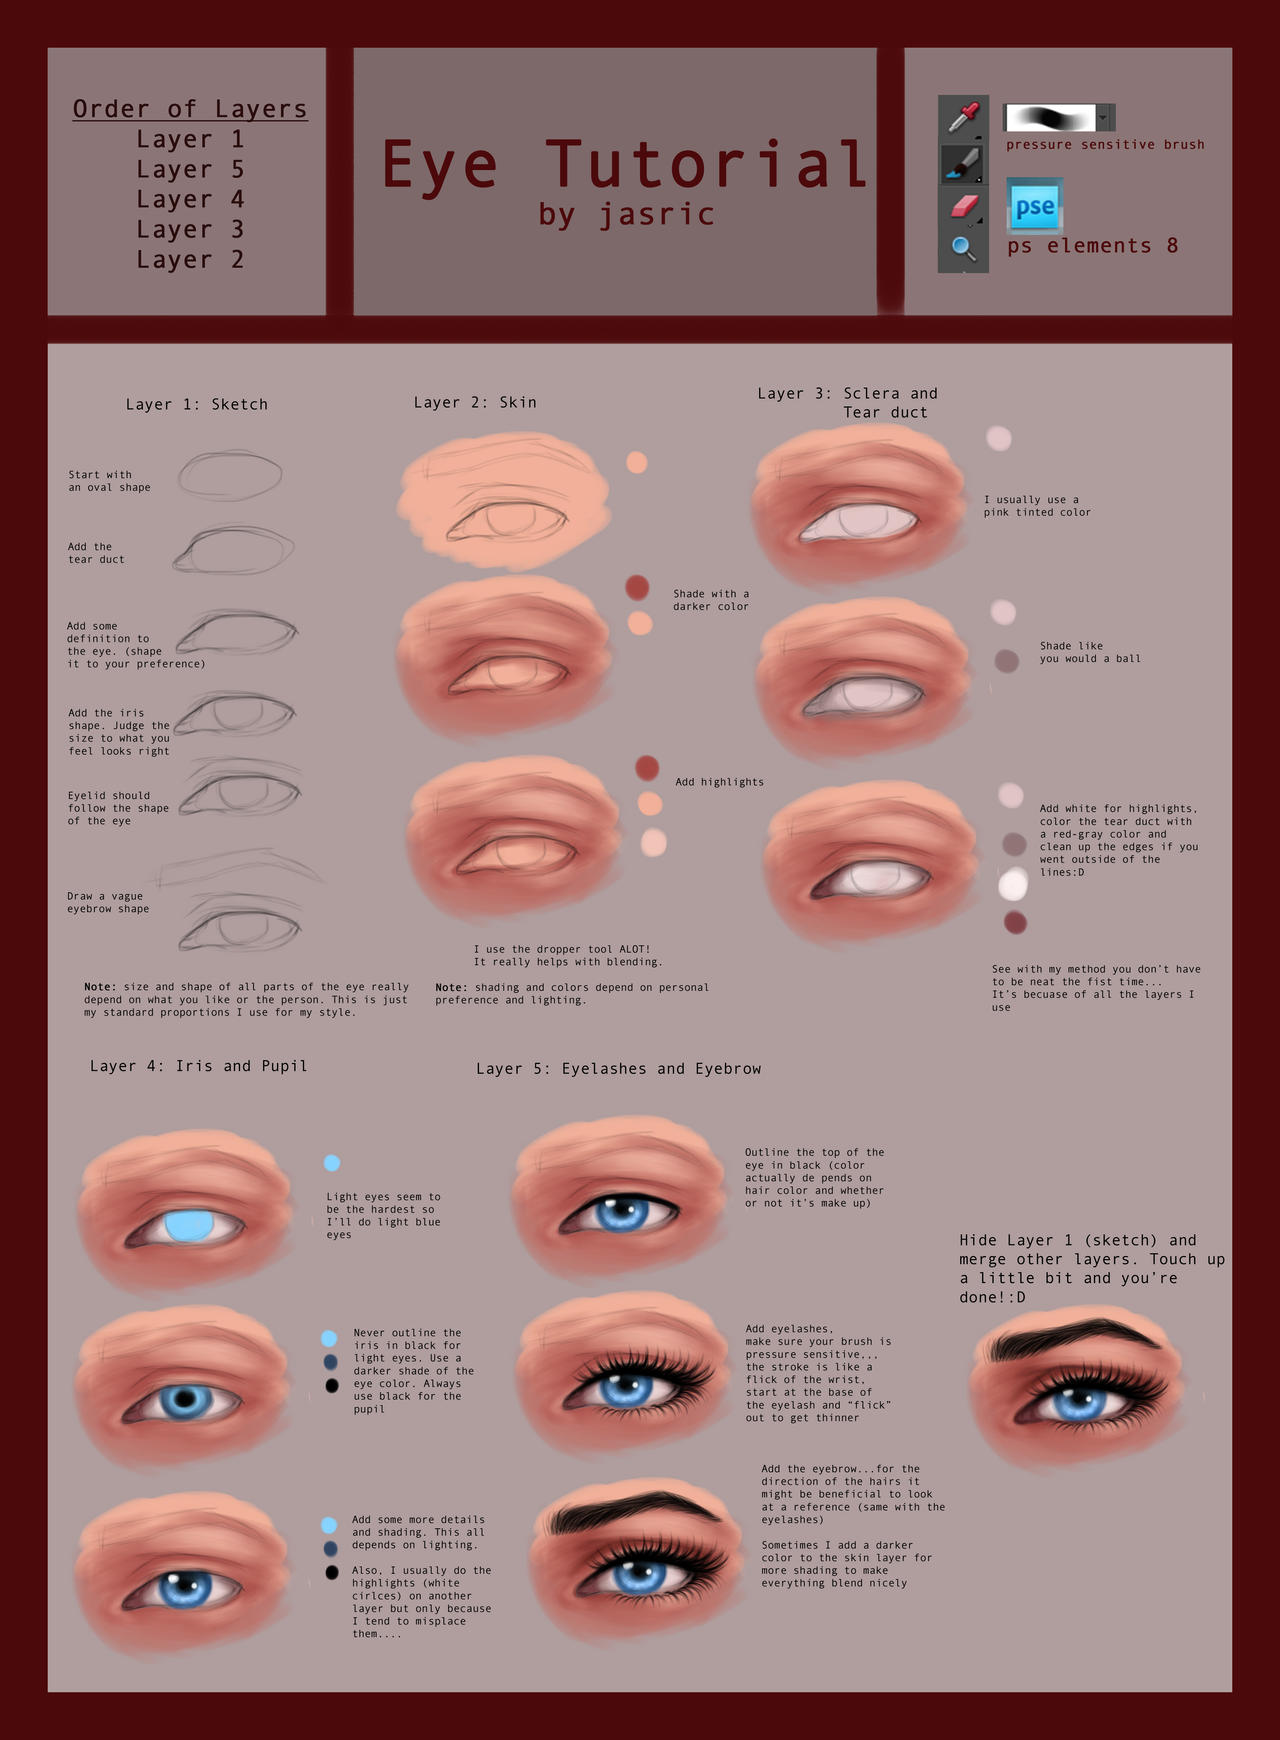 http://fc00.deviantart.net/fs70/i/2012/107/9/a/eye_tutorial_by_jasric-d4wiasq.jpg